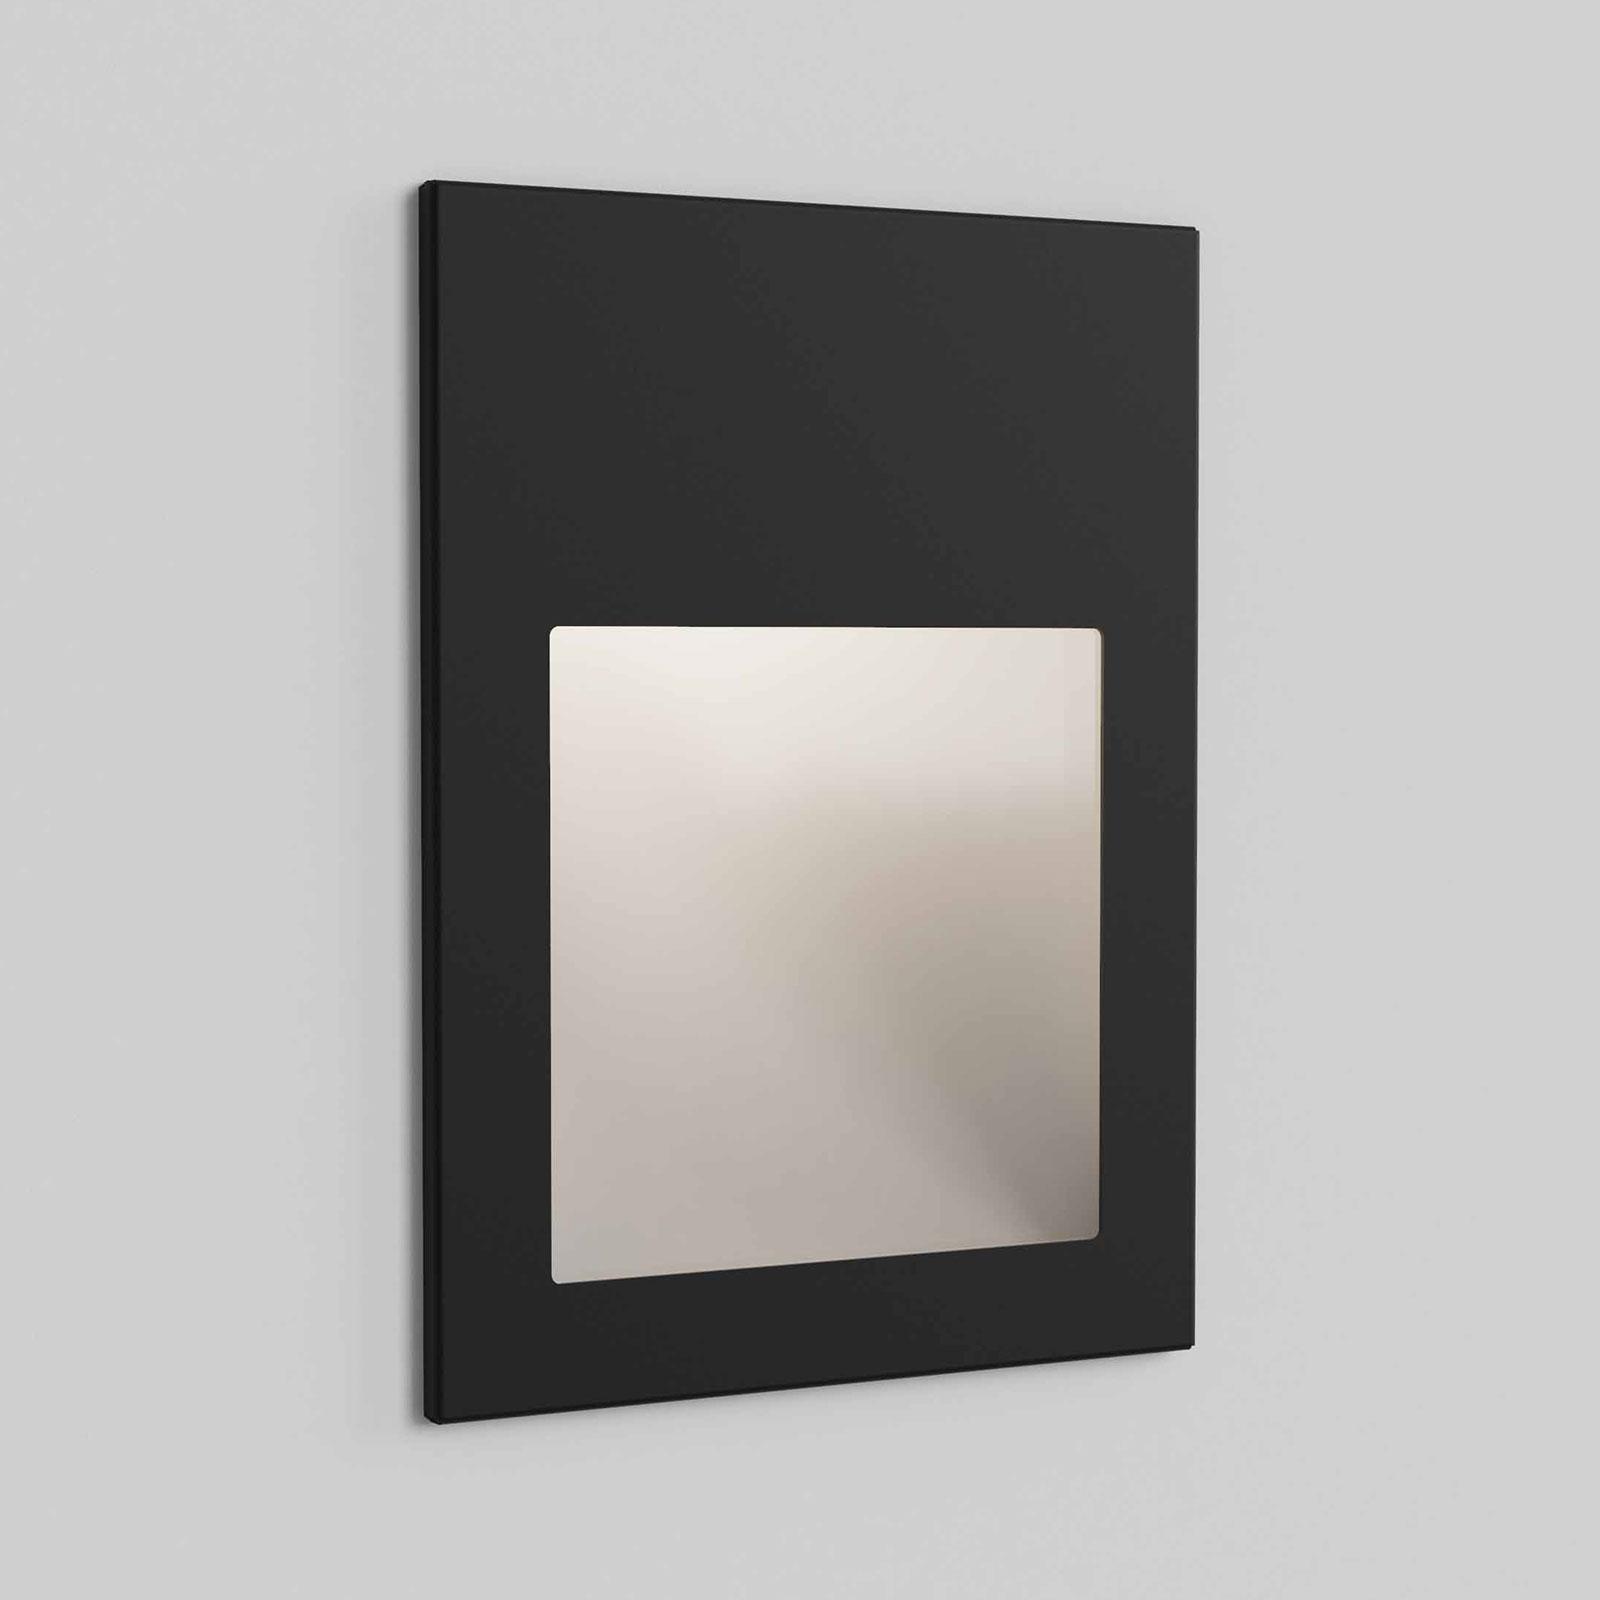 Astro Borgo 90 innfelt vegglampe, svart tekstur